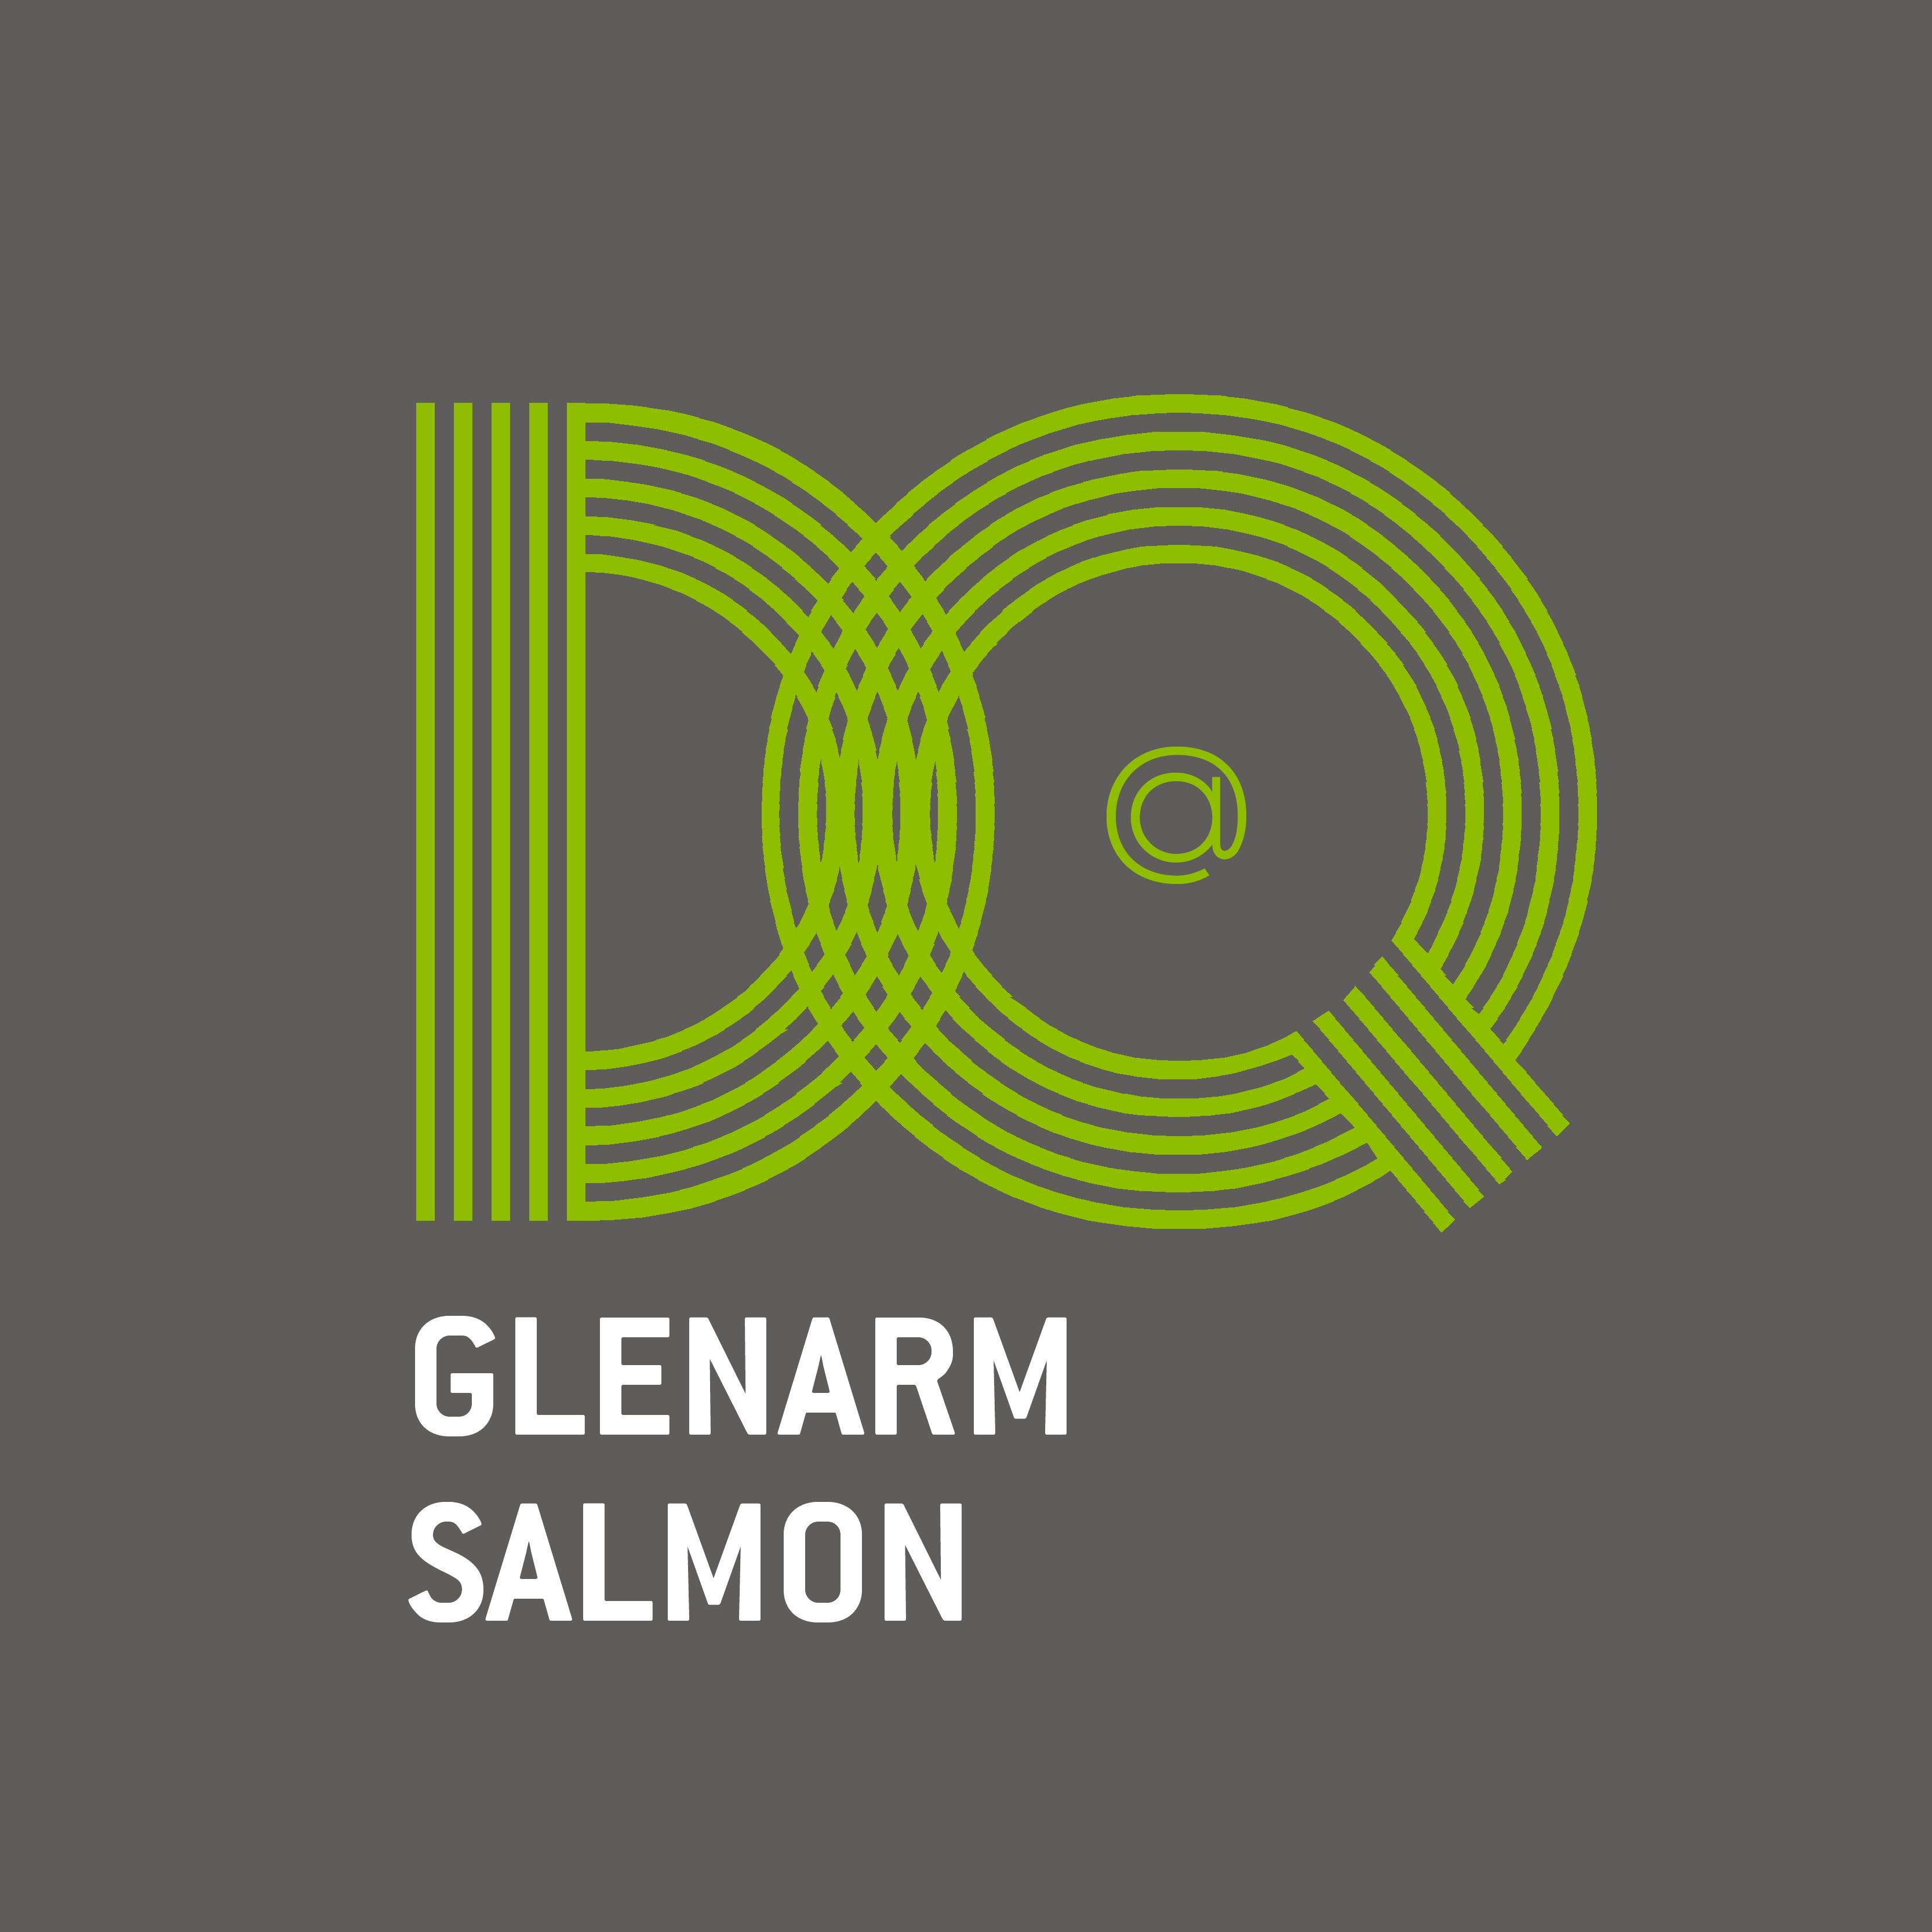 10. DQ - GLENARM SALMON